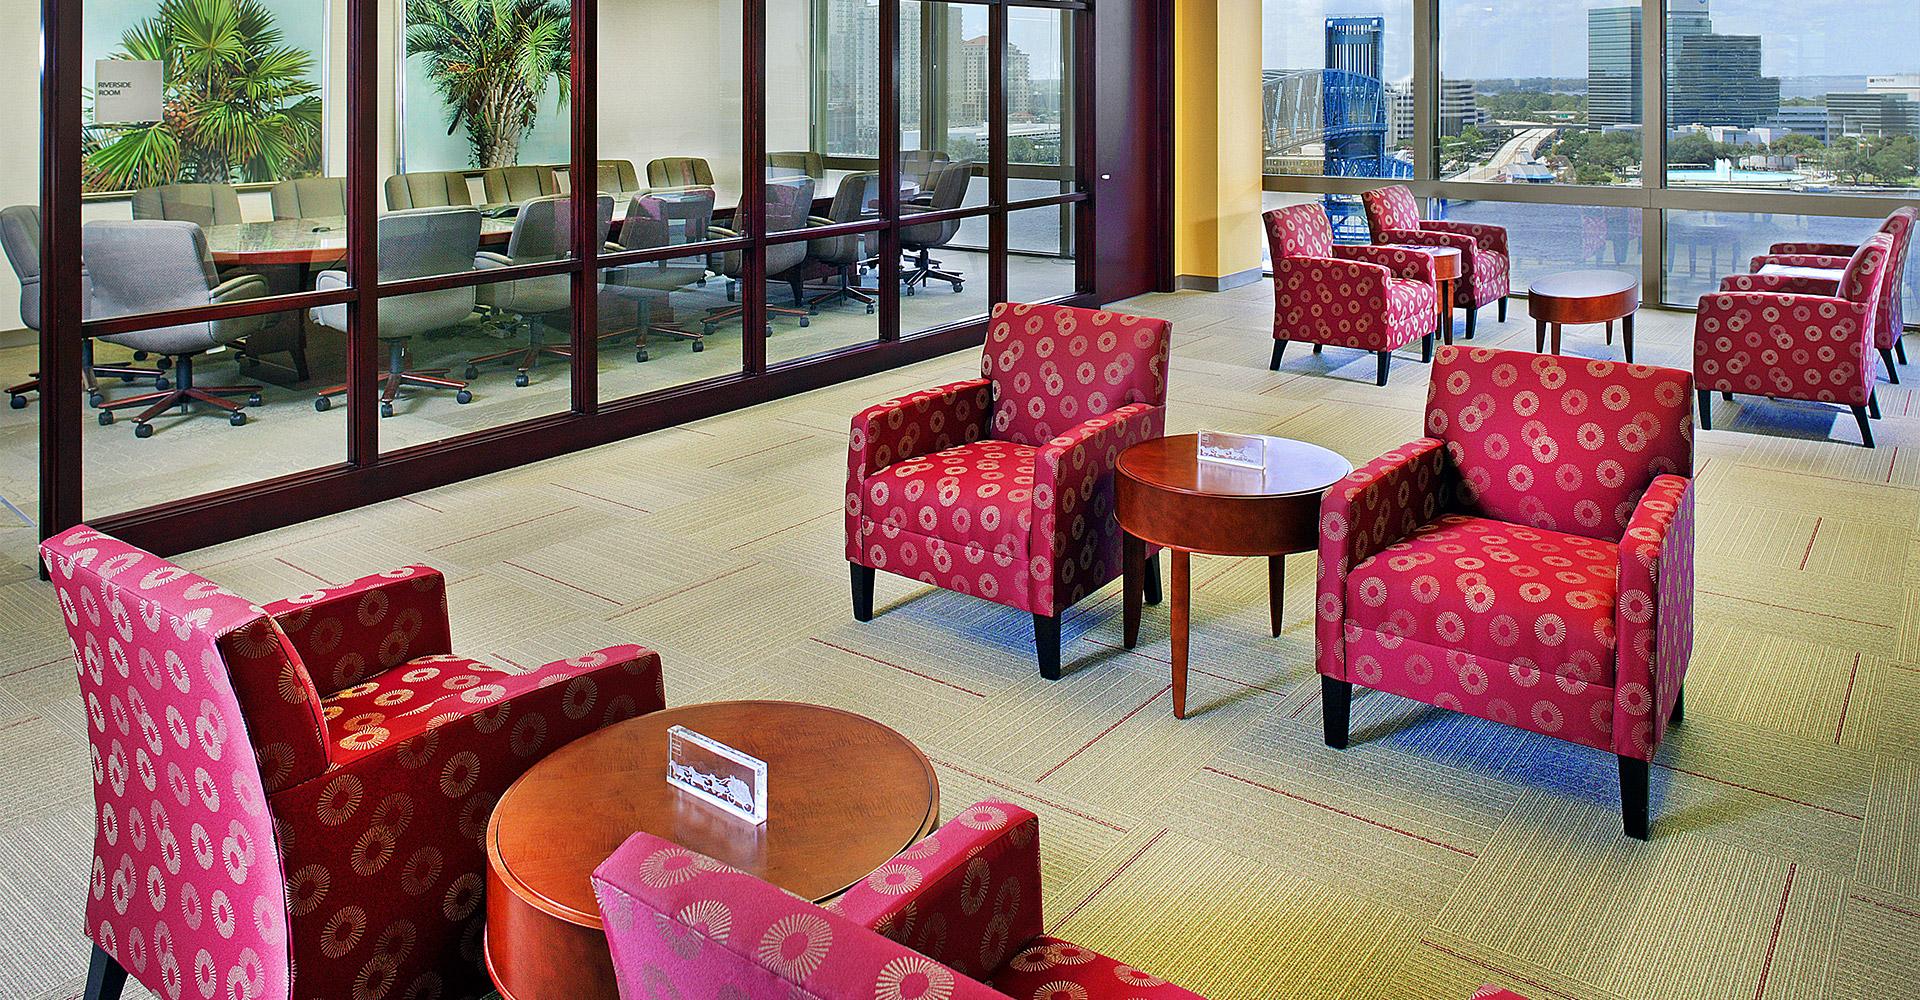 Wells Fargo lobby.